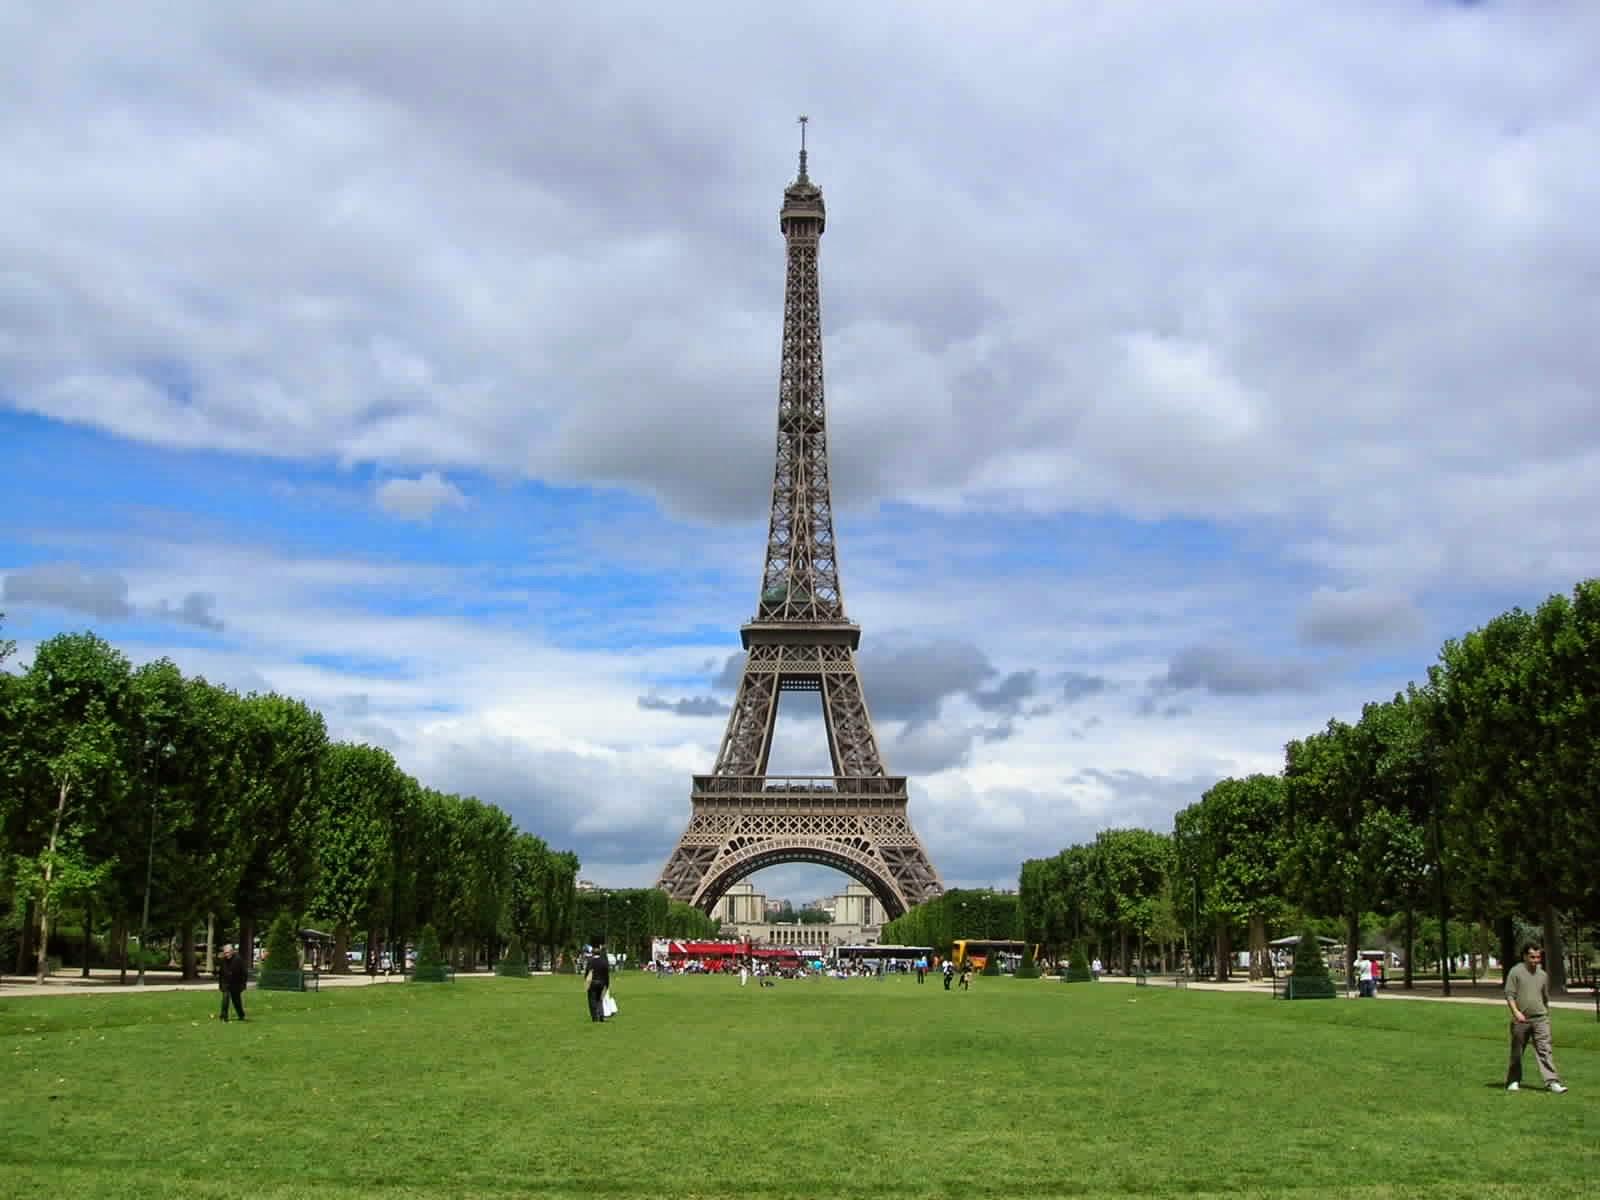 Beautiful Eiffel Tower أجمل عشر صور لبرج إيفل الفرنسي مجلة فراولة